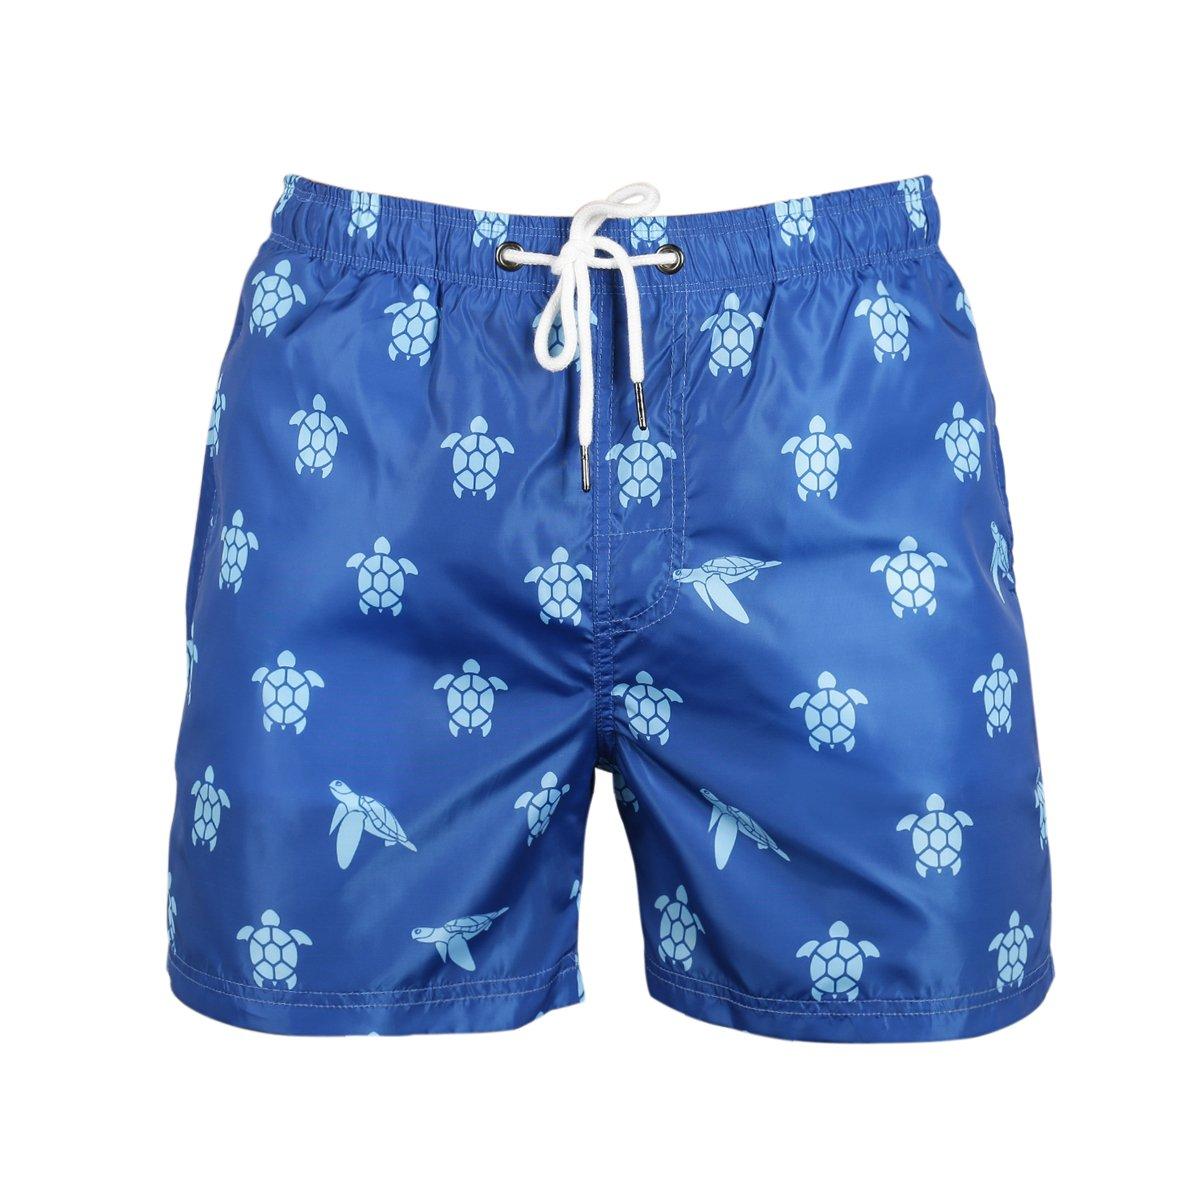 NAKI Mens Swim Trunks Quick Dry Slim Fit Bathing Suits Swimming Short Pockets Men, Season NAKI Swim Trunks